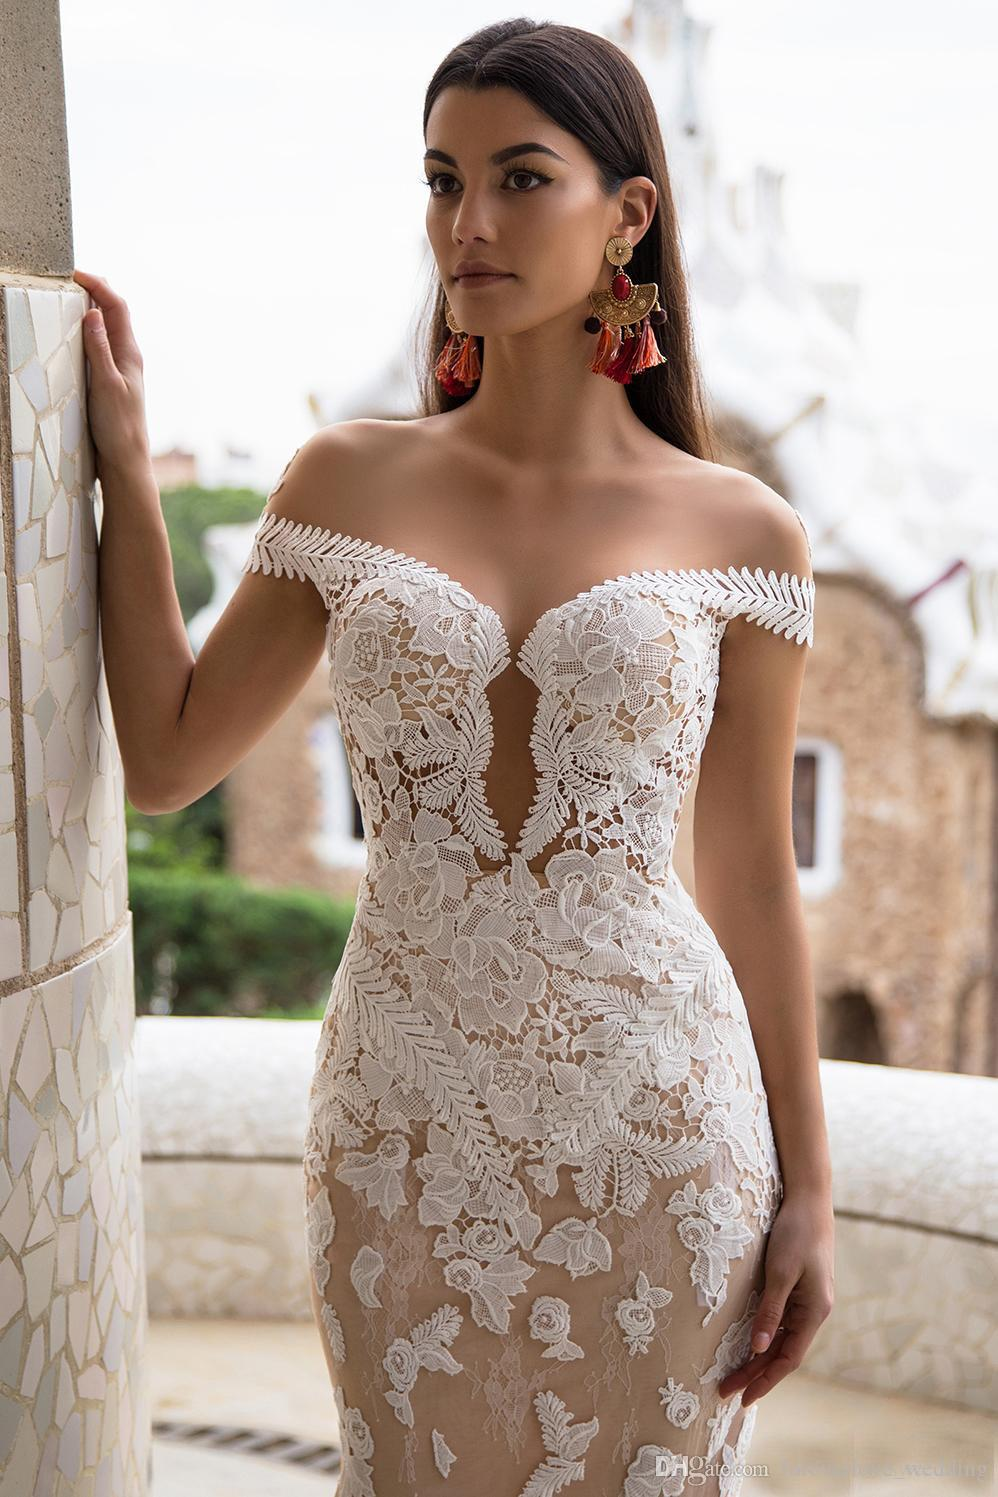 Milla Nova Champagne Mermaid Wedding Dresses with Detachable Train Robe de Mariée Sexy Off the Shoulder Lace Appliques Backless Bridal Gowns